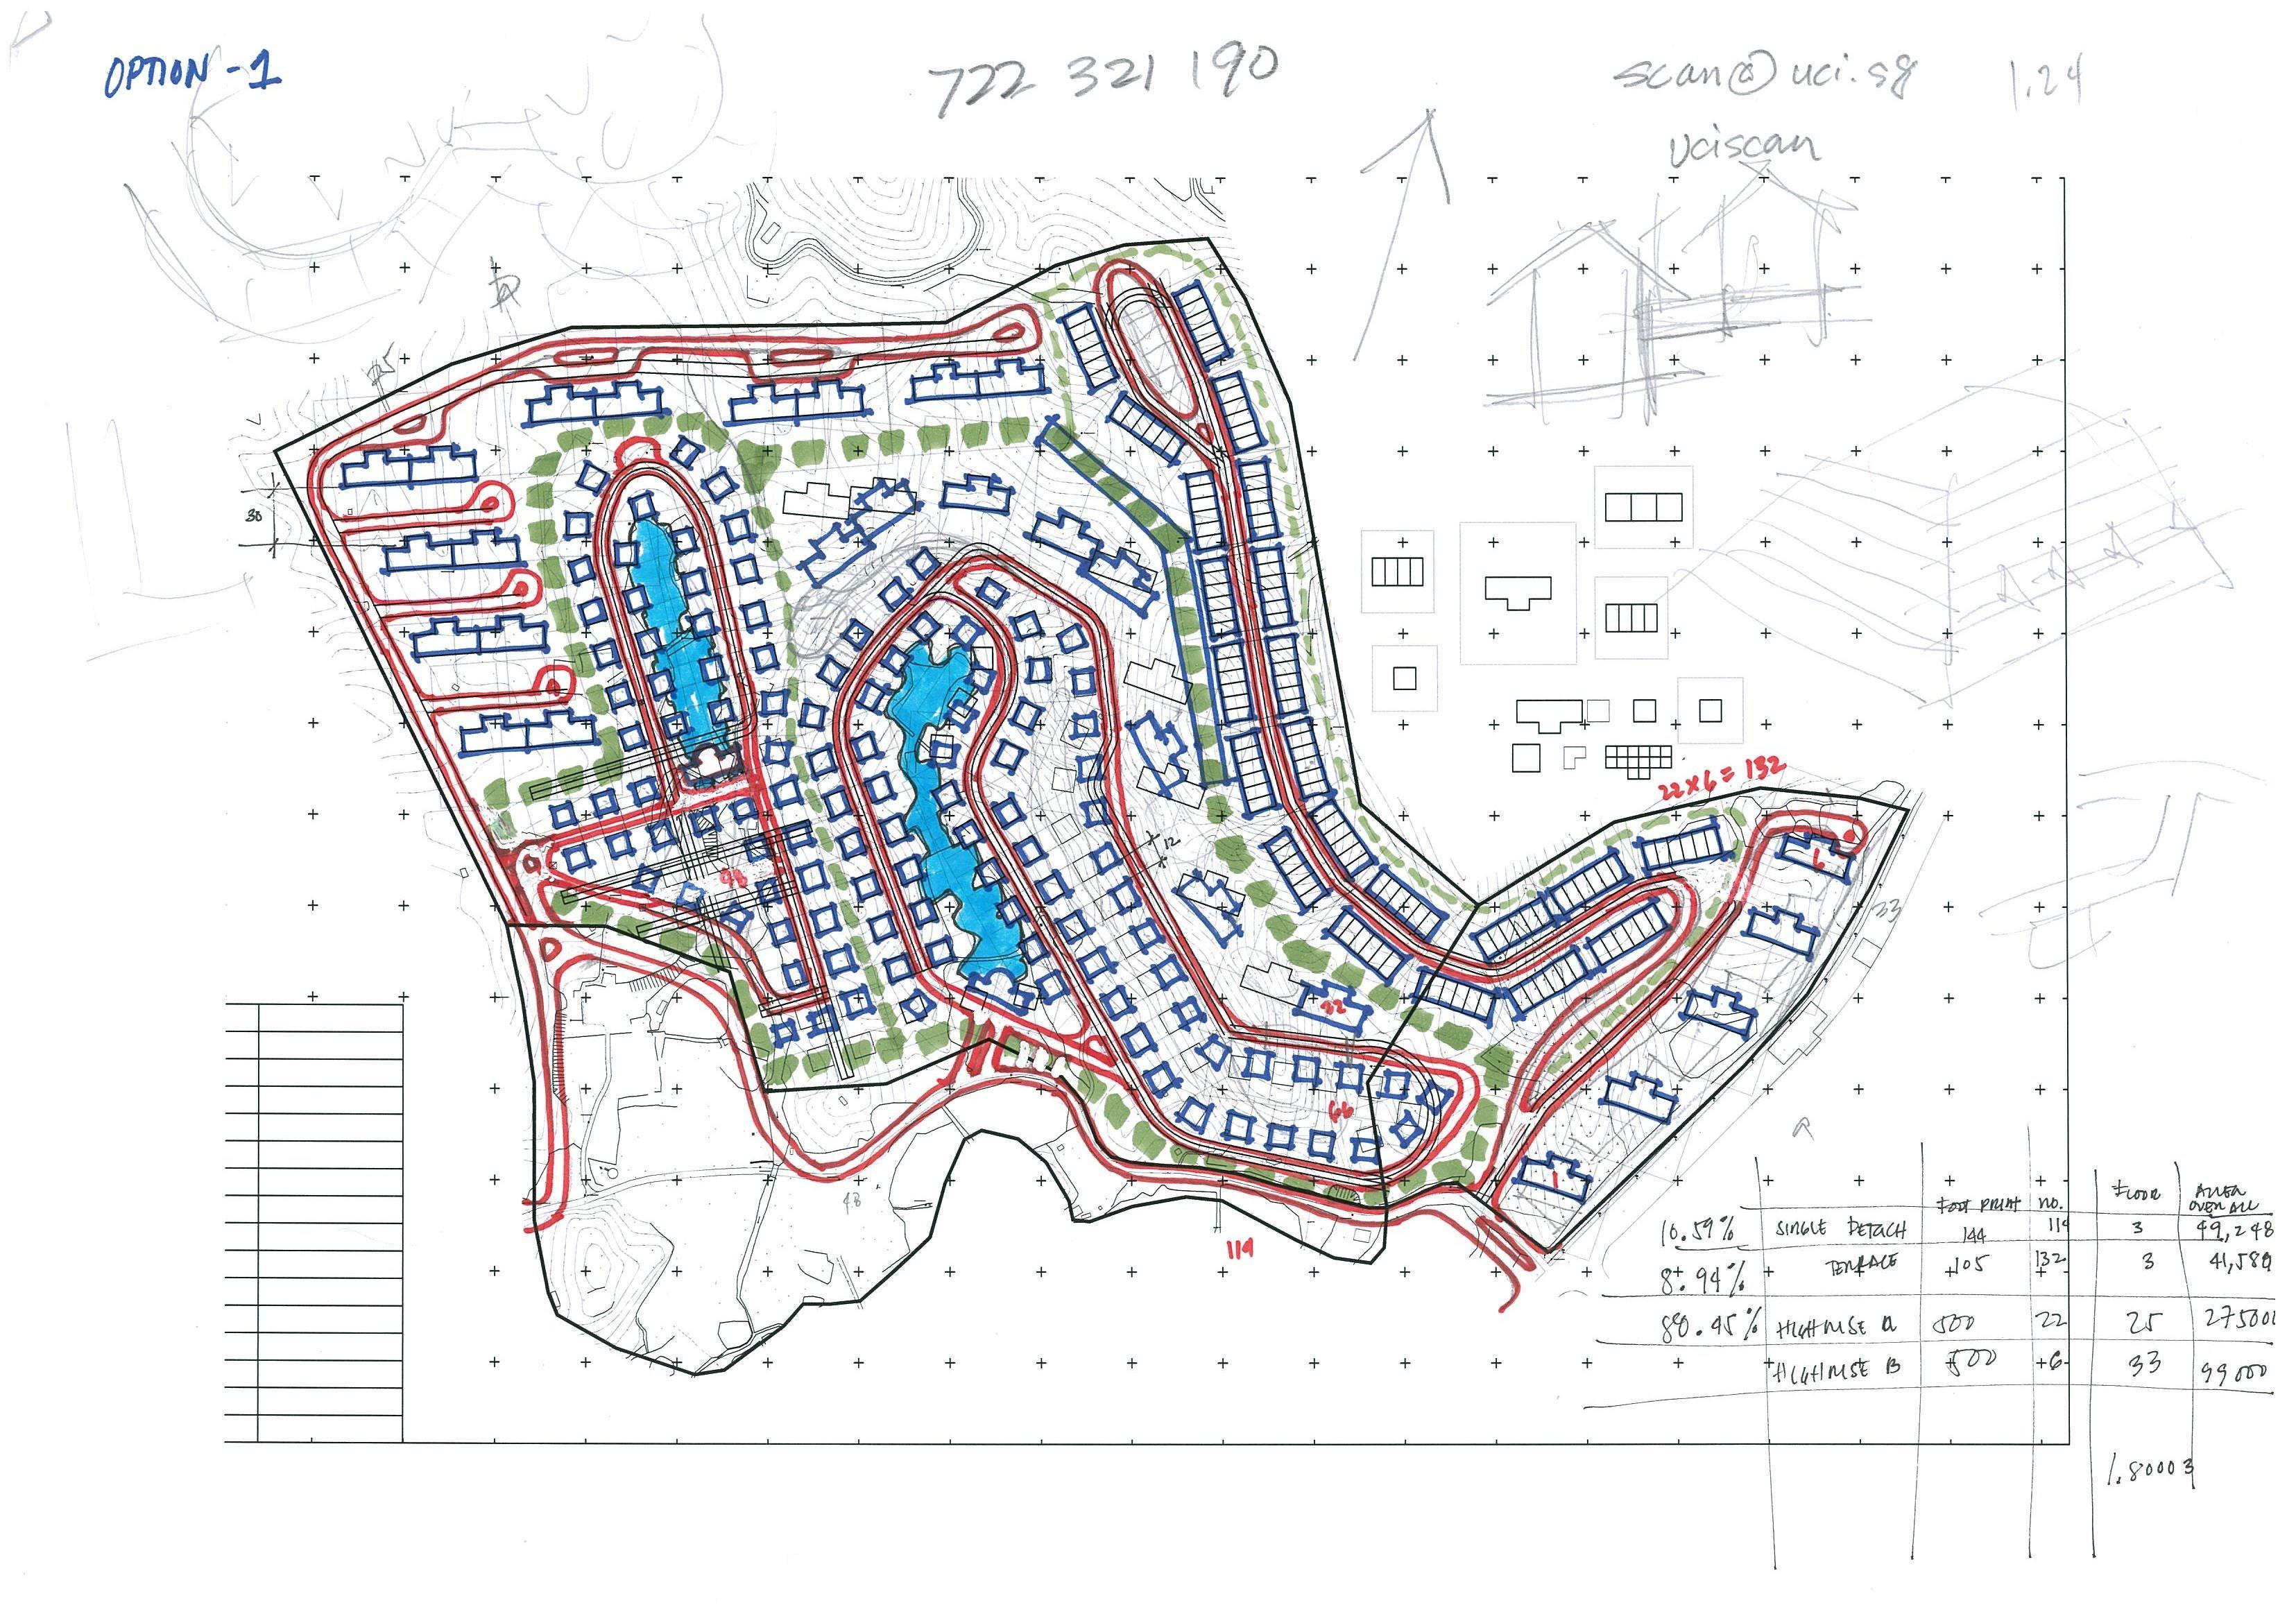 Planning Process Preliminary Master Plan Sketch Road Design Master Plan Plan Sketch Road Design